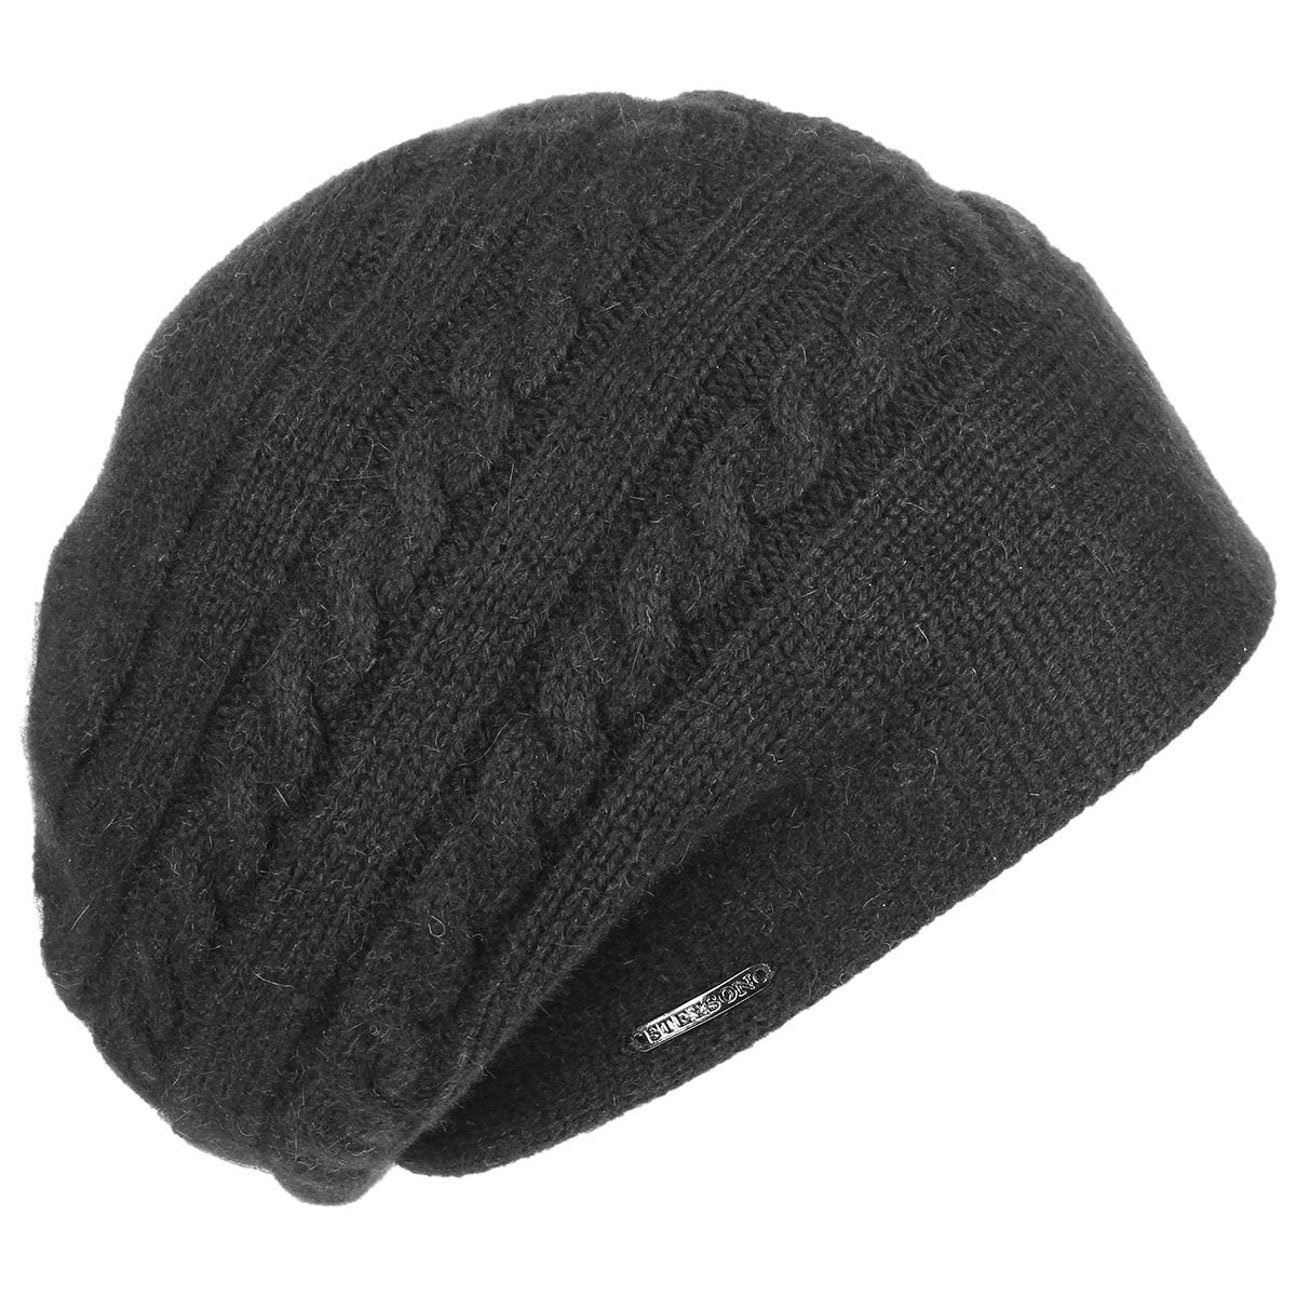 Stetson Itasca Alpaca Wool Knit Hat Women Black One Size by Stetson